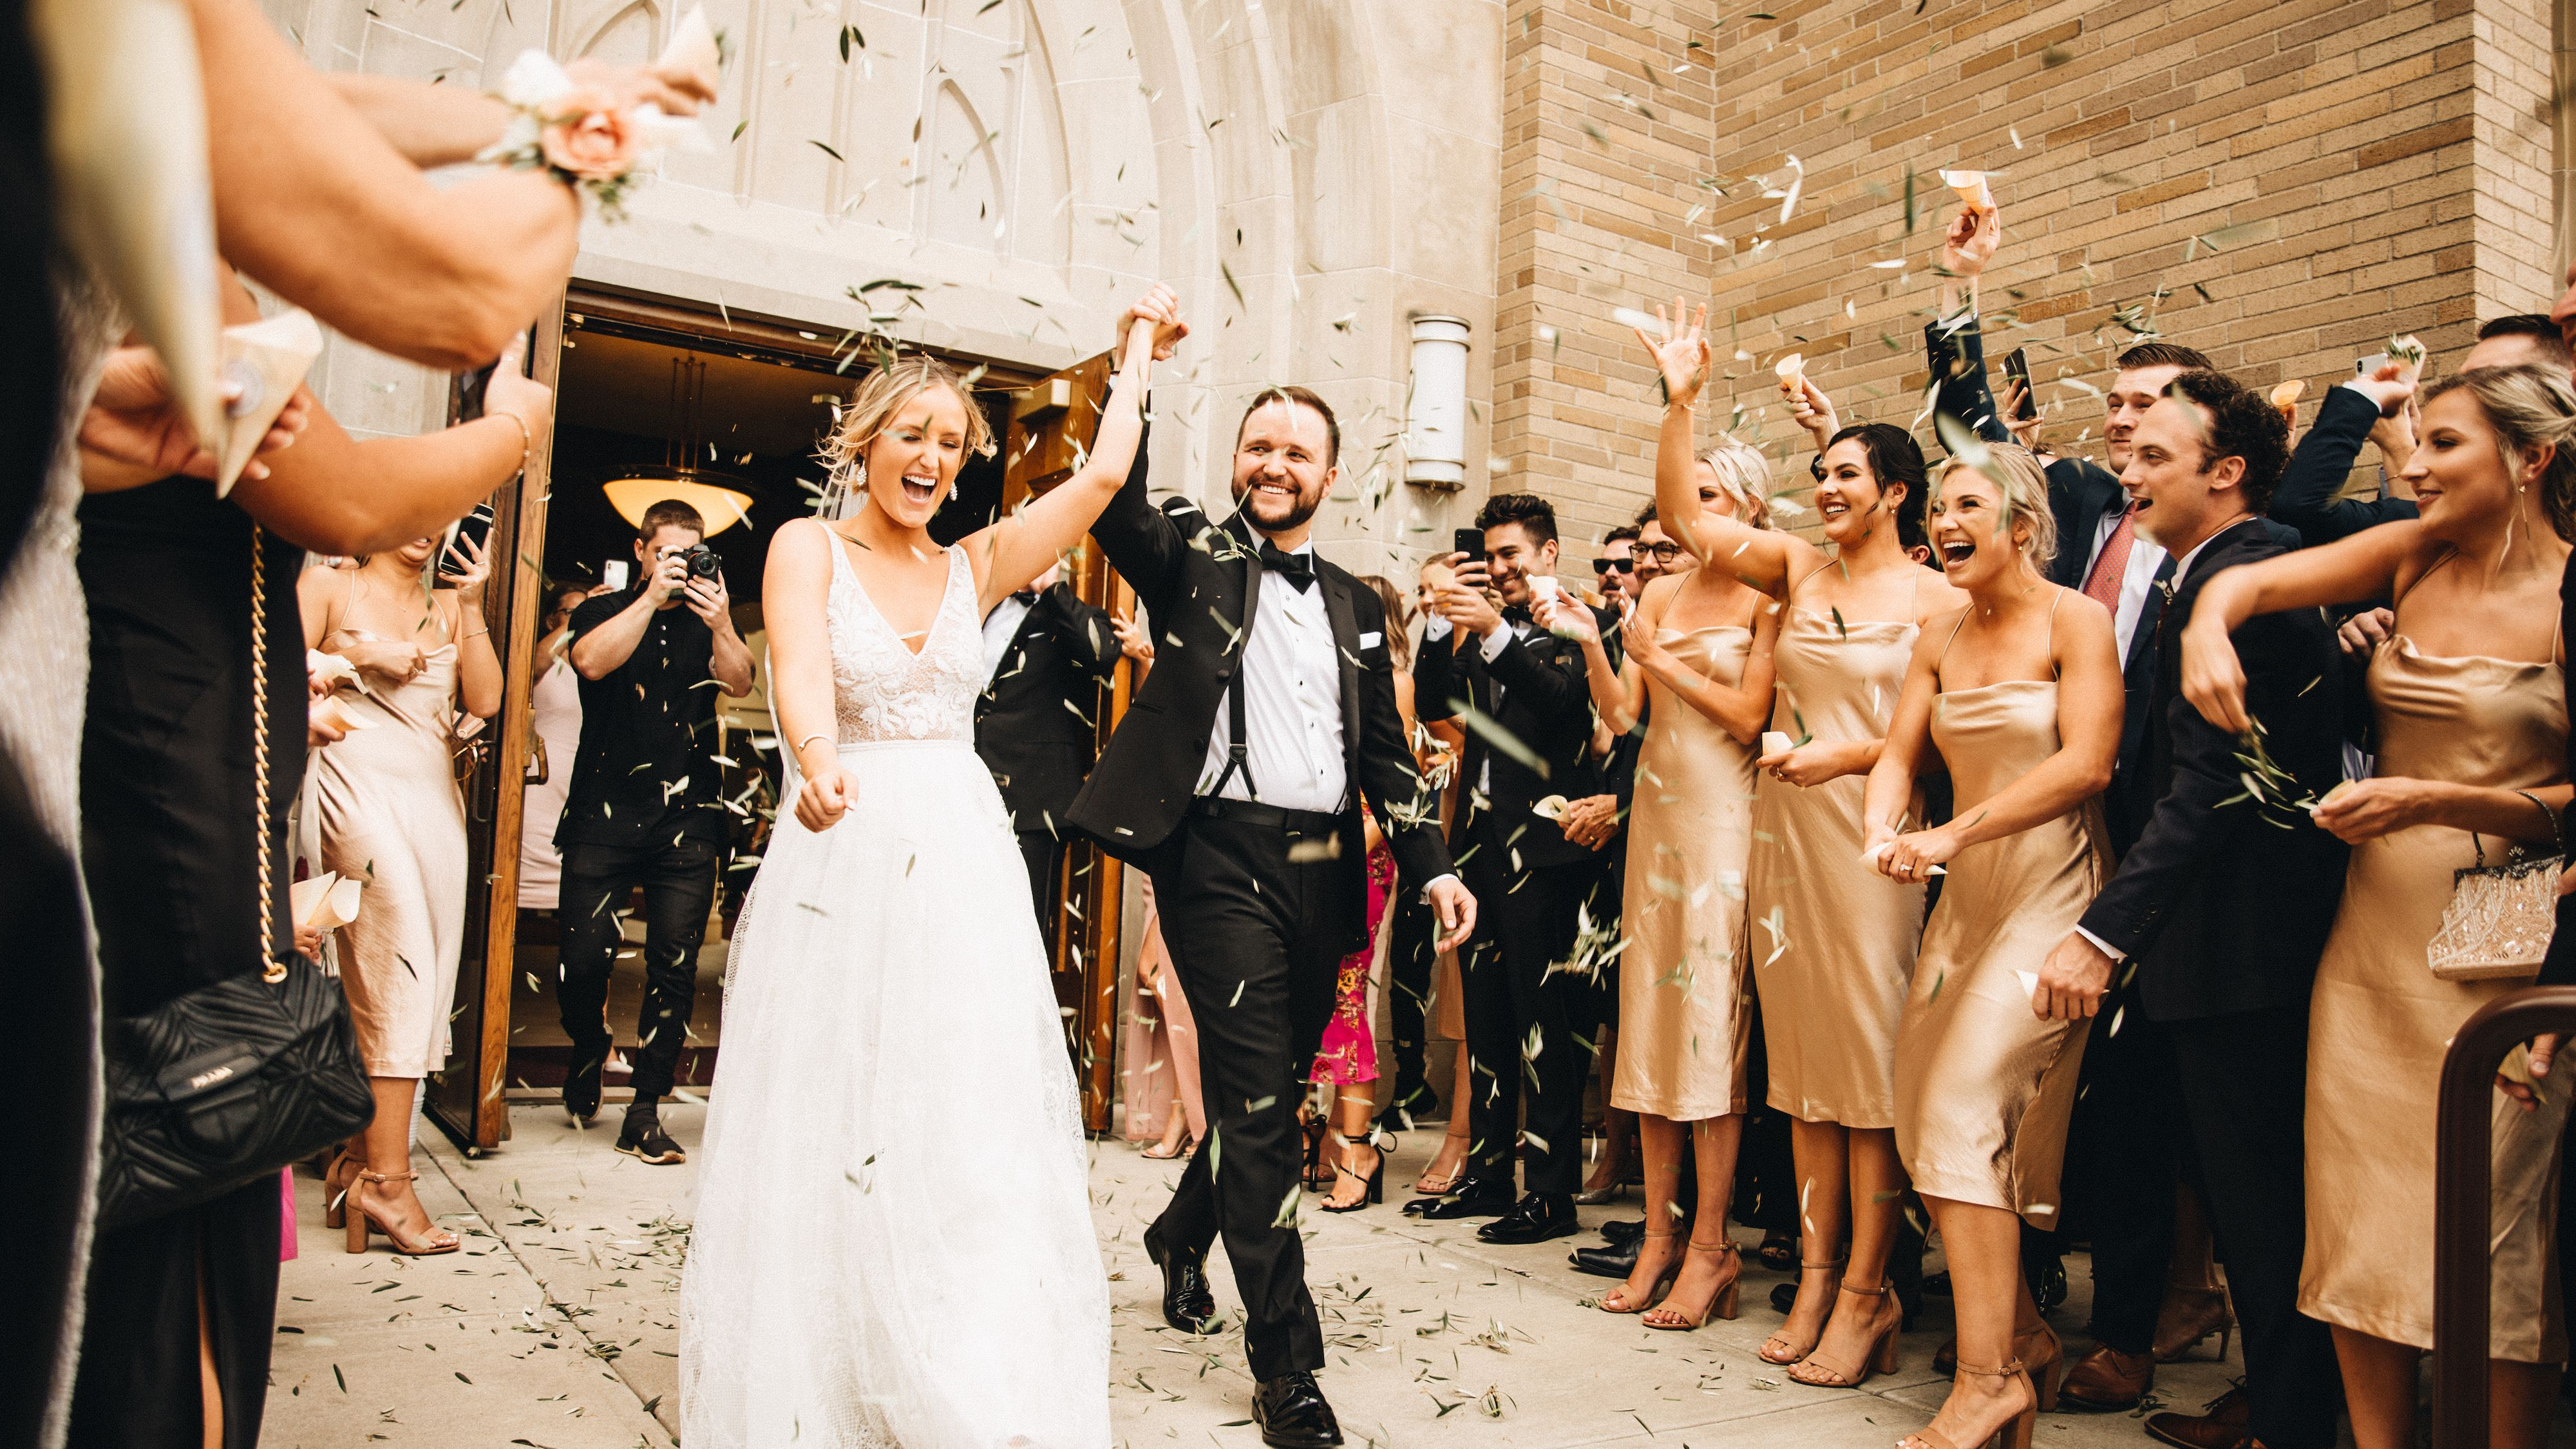 Musician Quinn Xcii And Macy Uekert S Vintage Inspired Wedding In Michigan,Sophia Tolli Plus Size Wedding Dresses